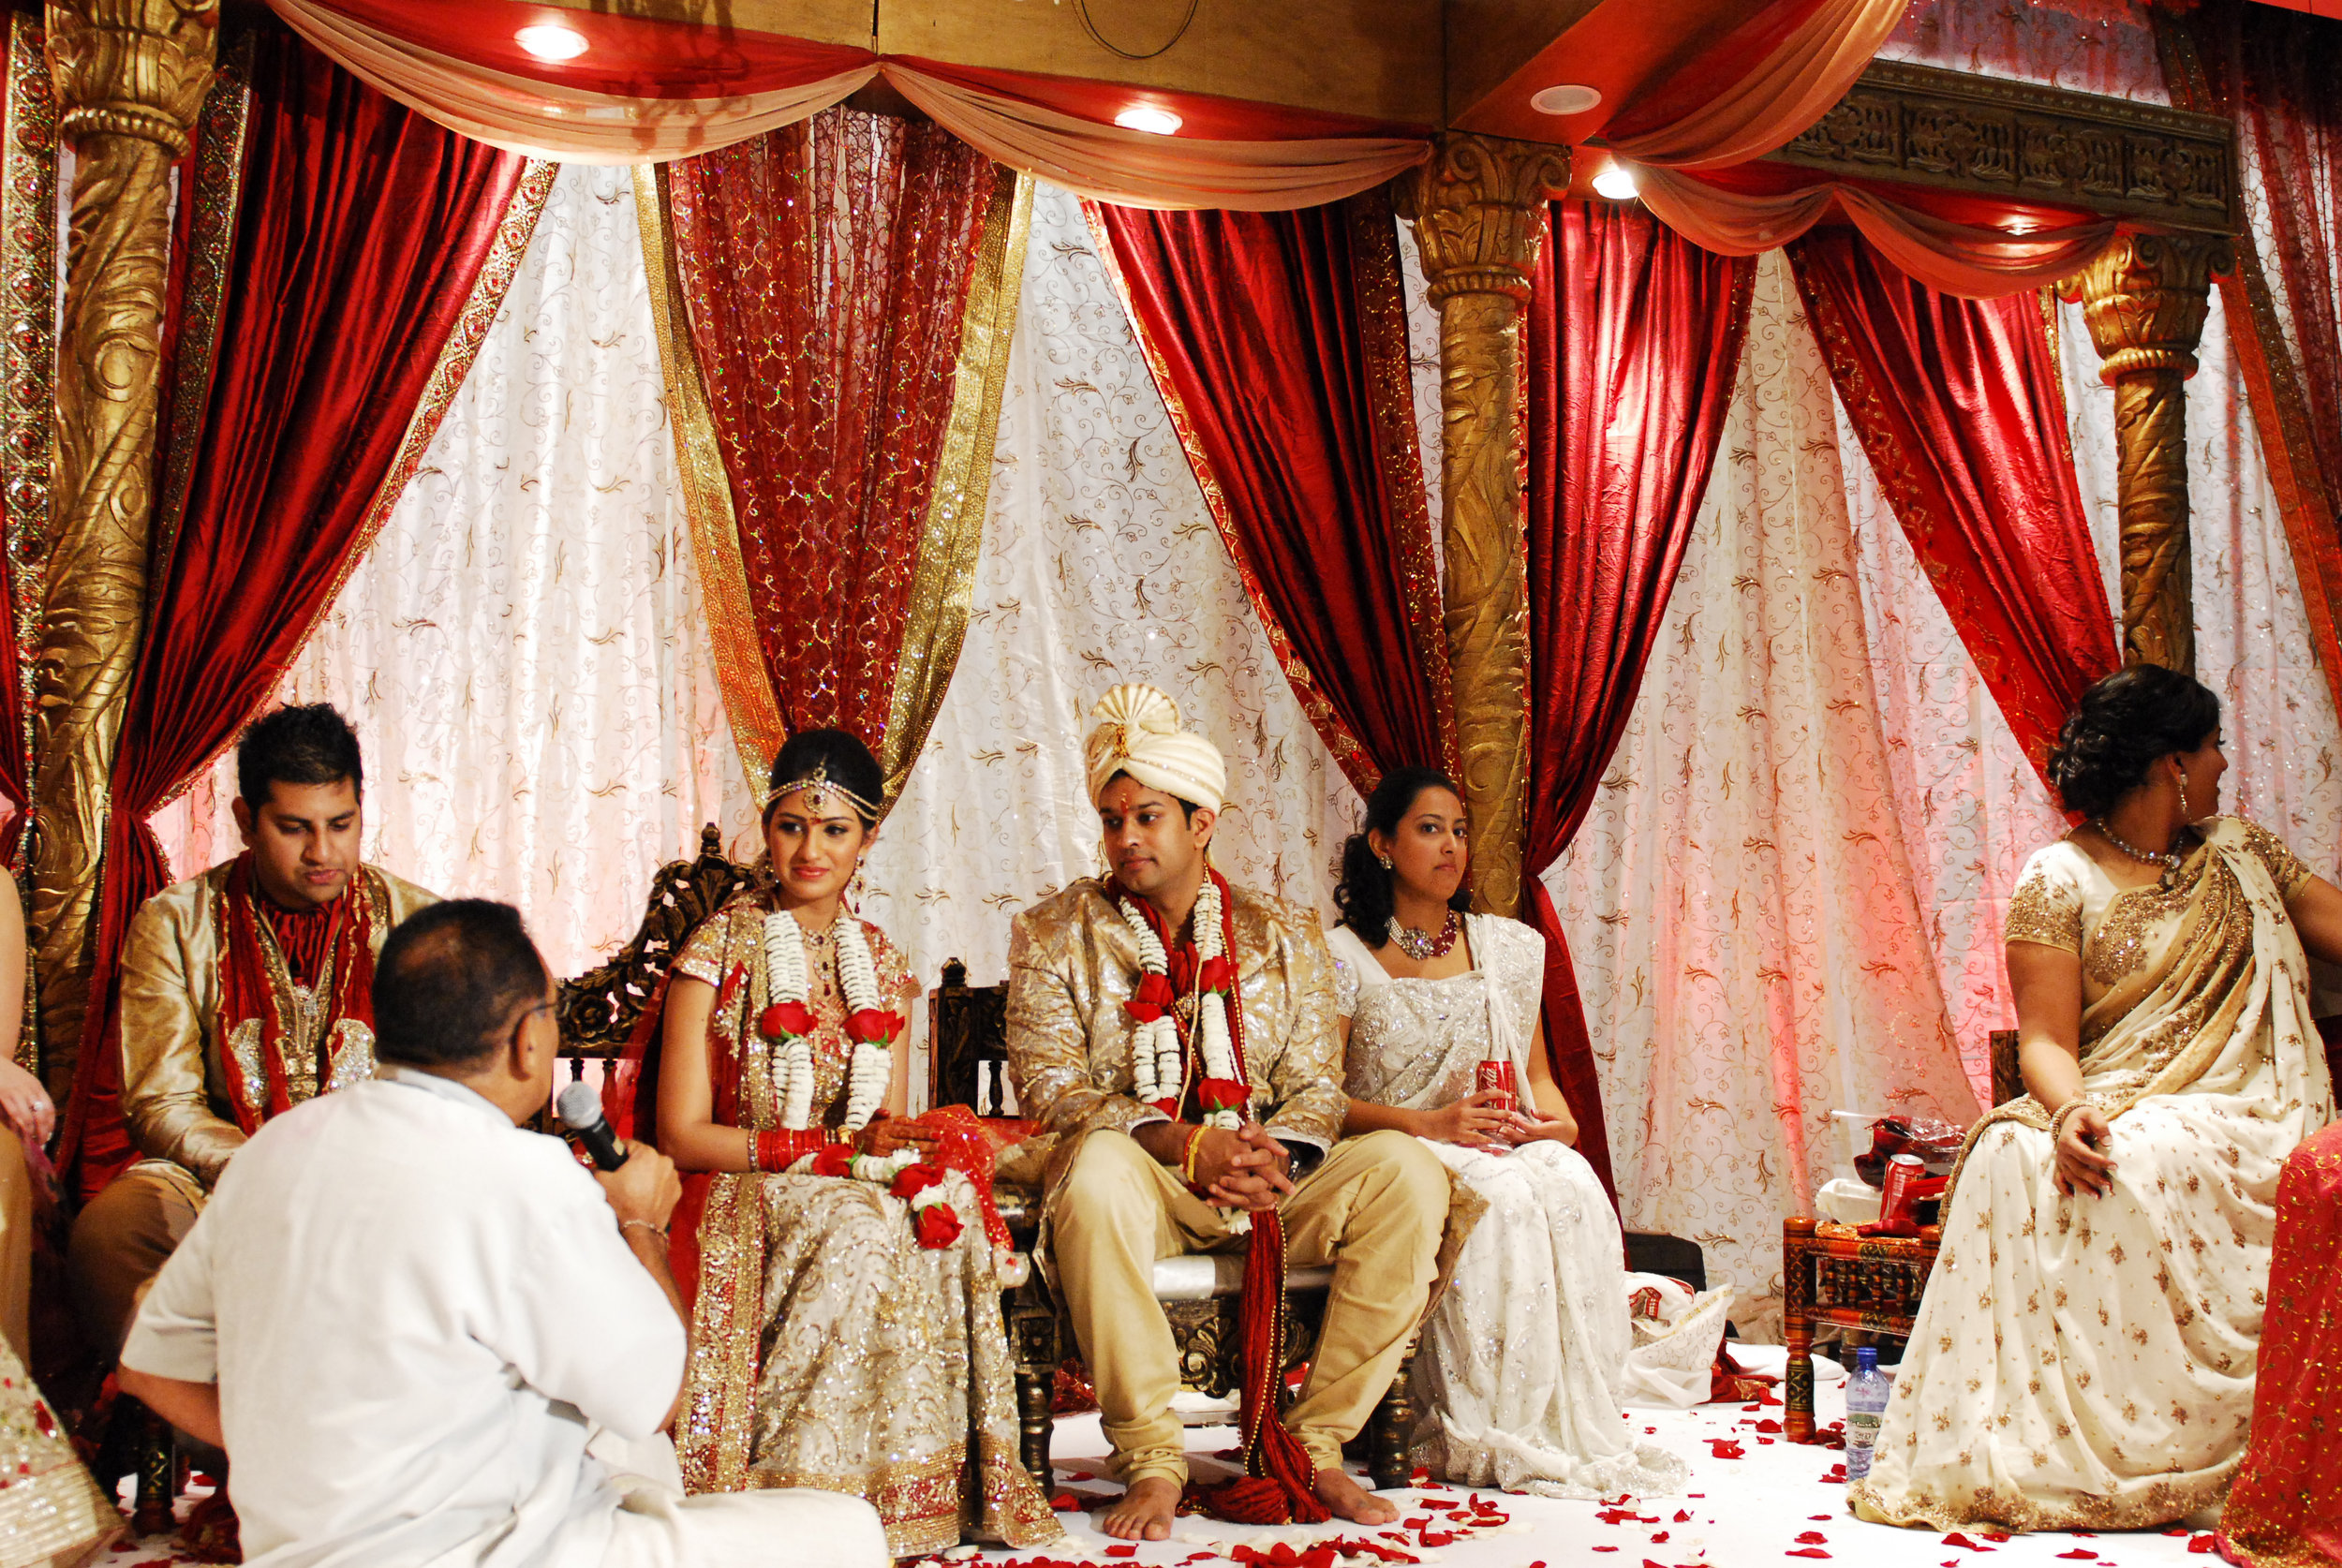 houston-weddings-rupali-shalin-01.jpg